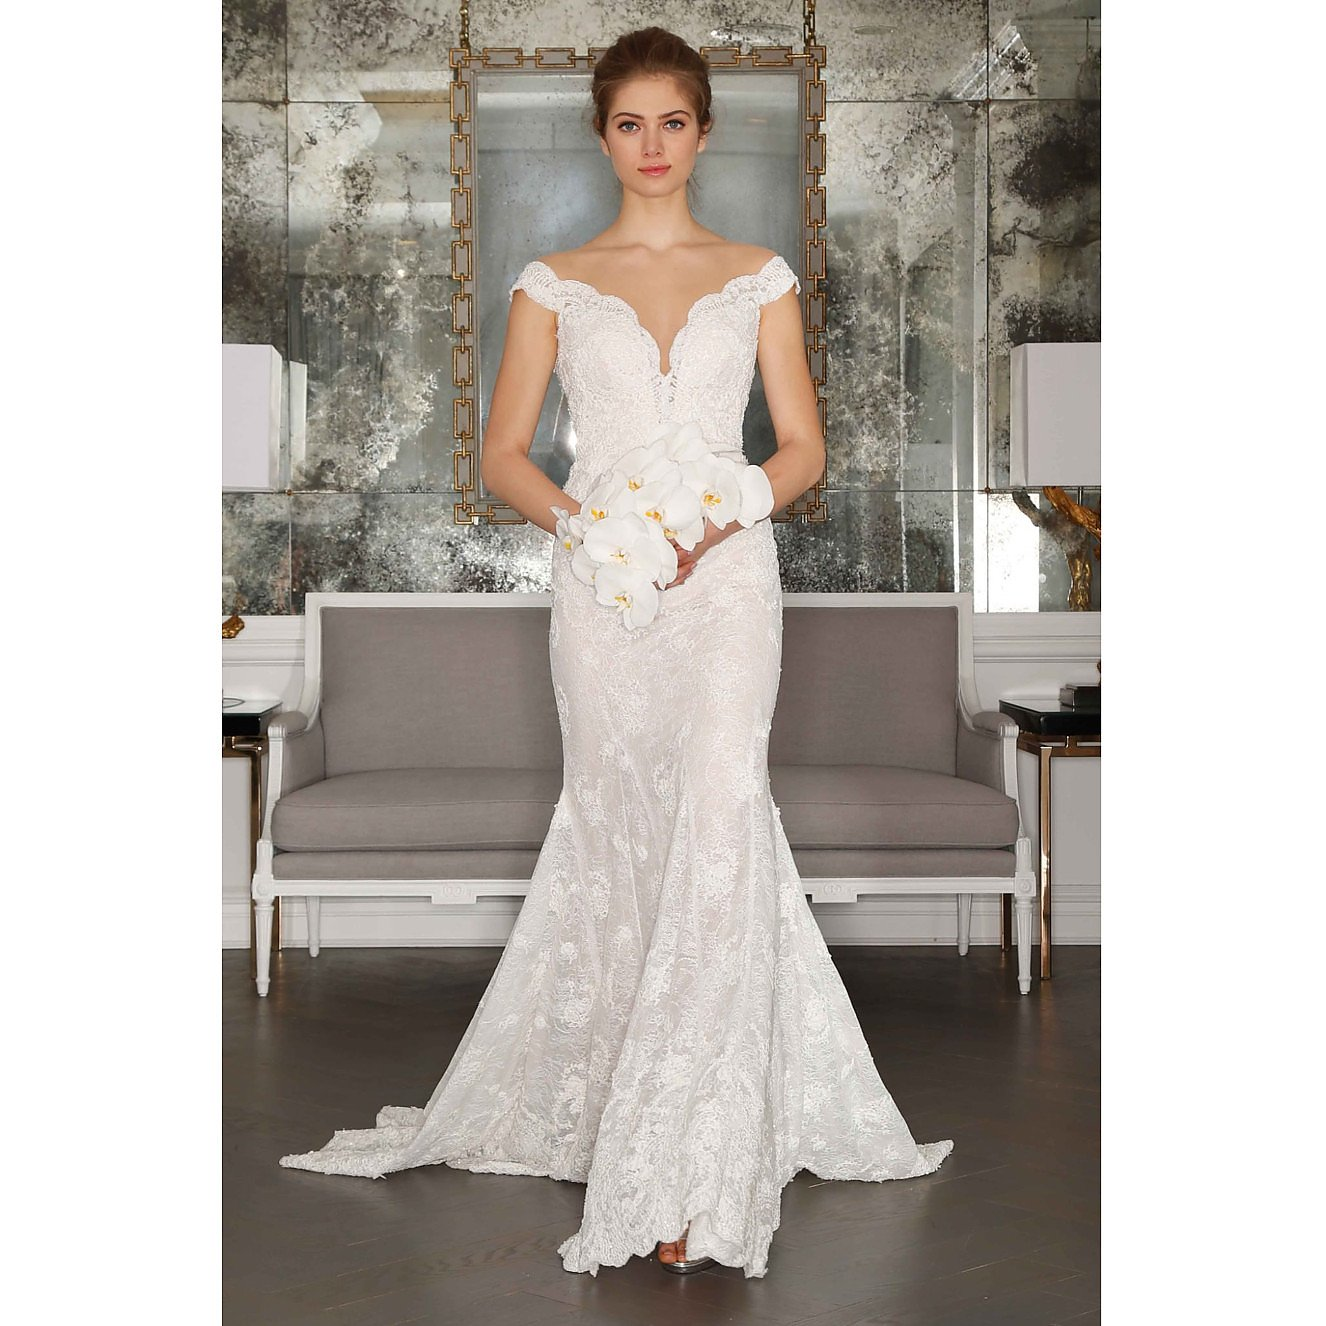 Romona Keveza RK7406 Dress